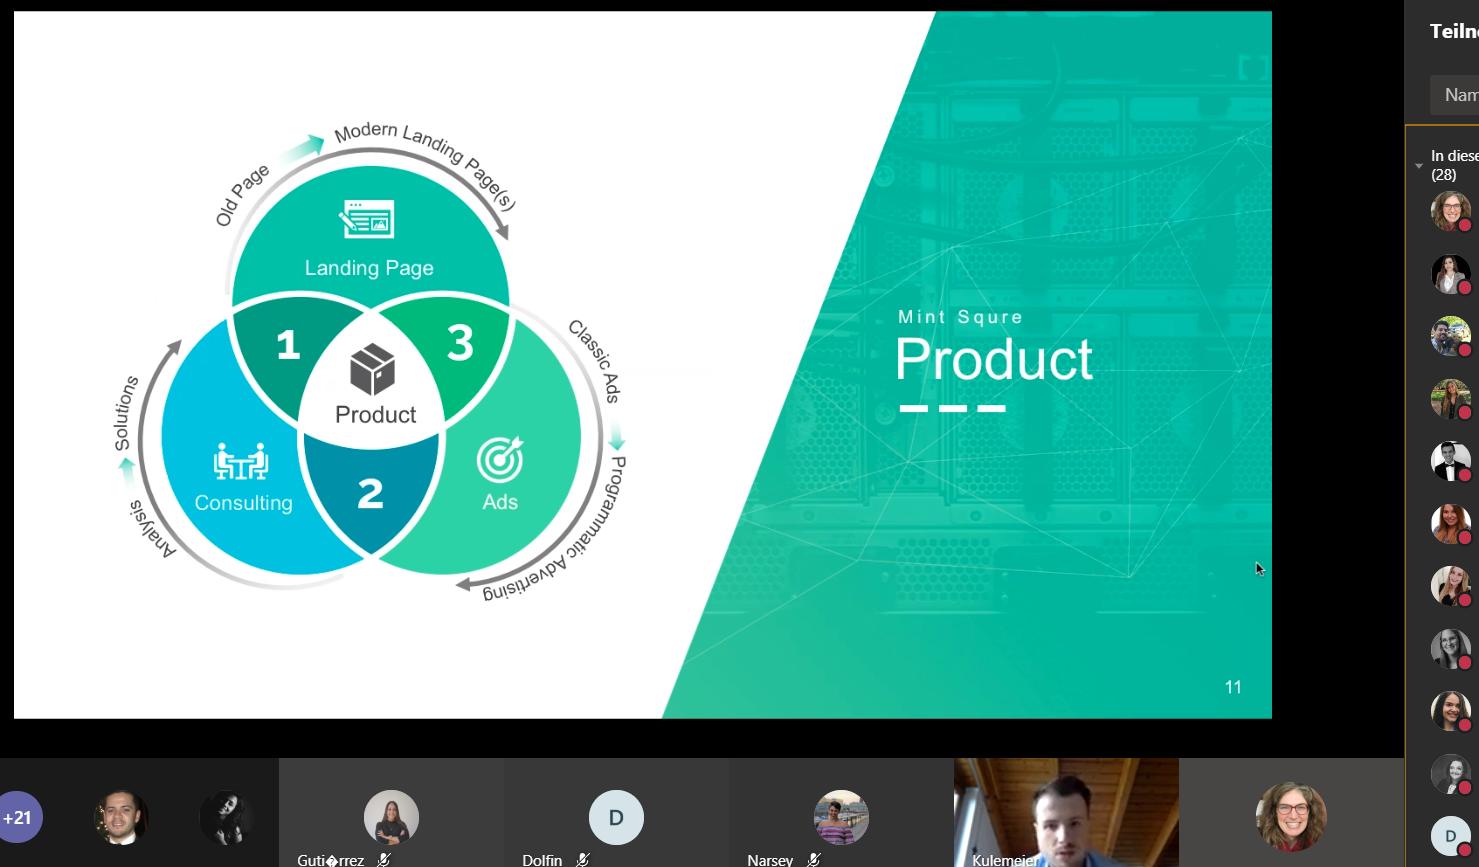 business-project-mit-mint-square